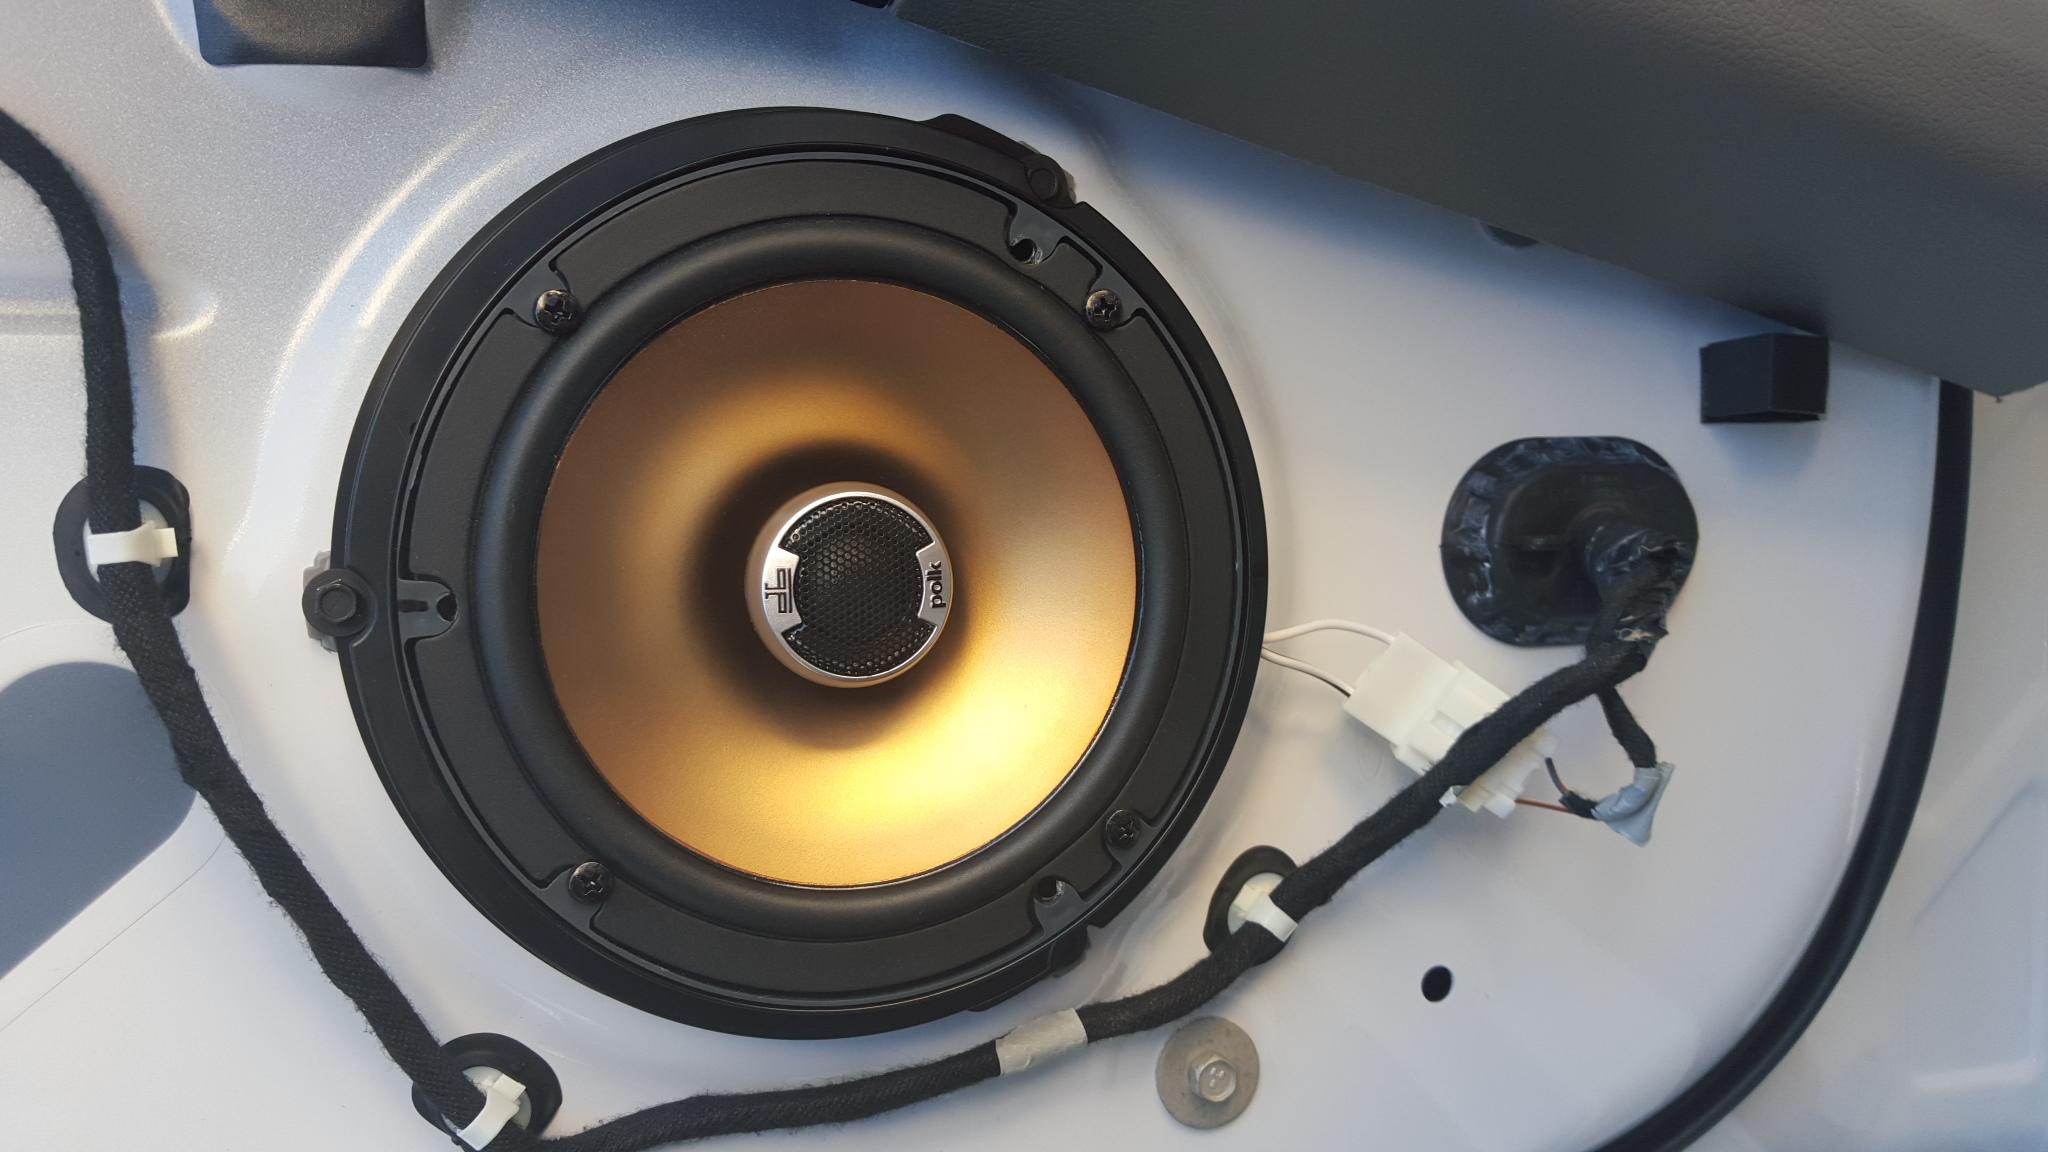 hight resolution of  metra speaker amp harness adapters 20160221 100947 jpg